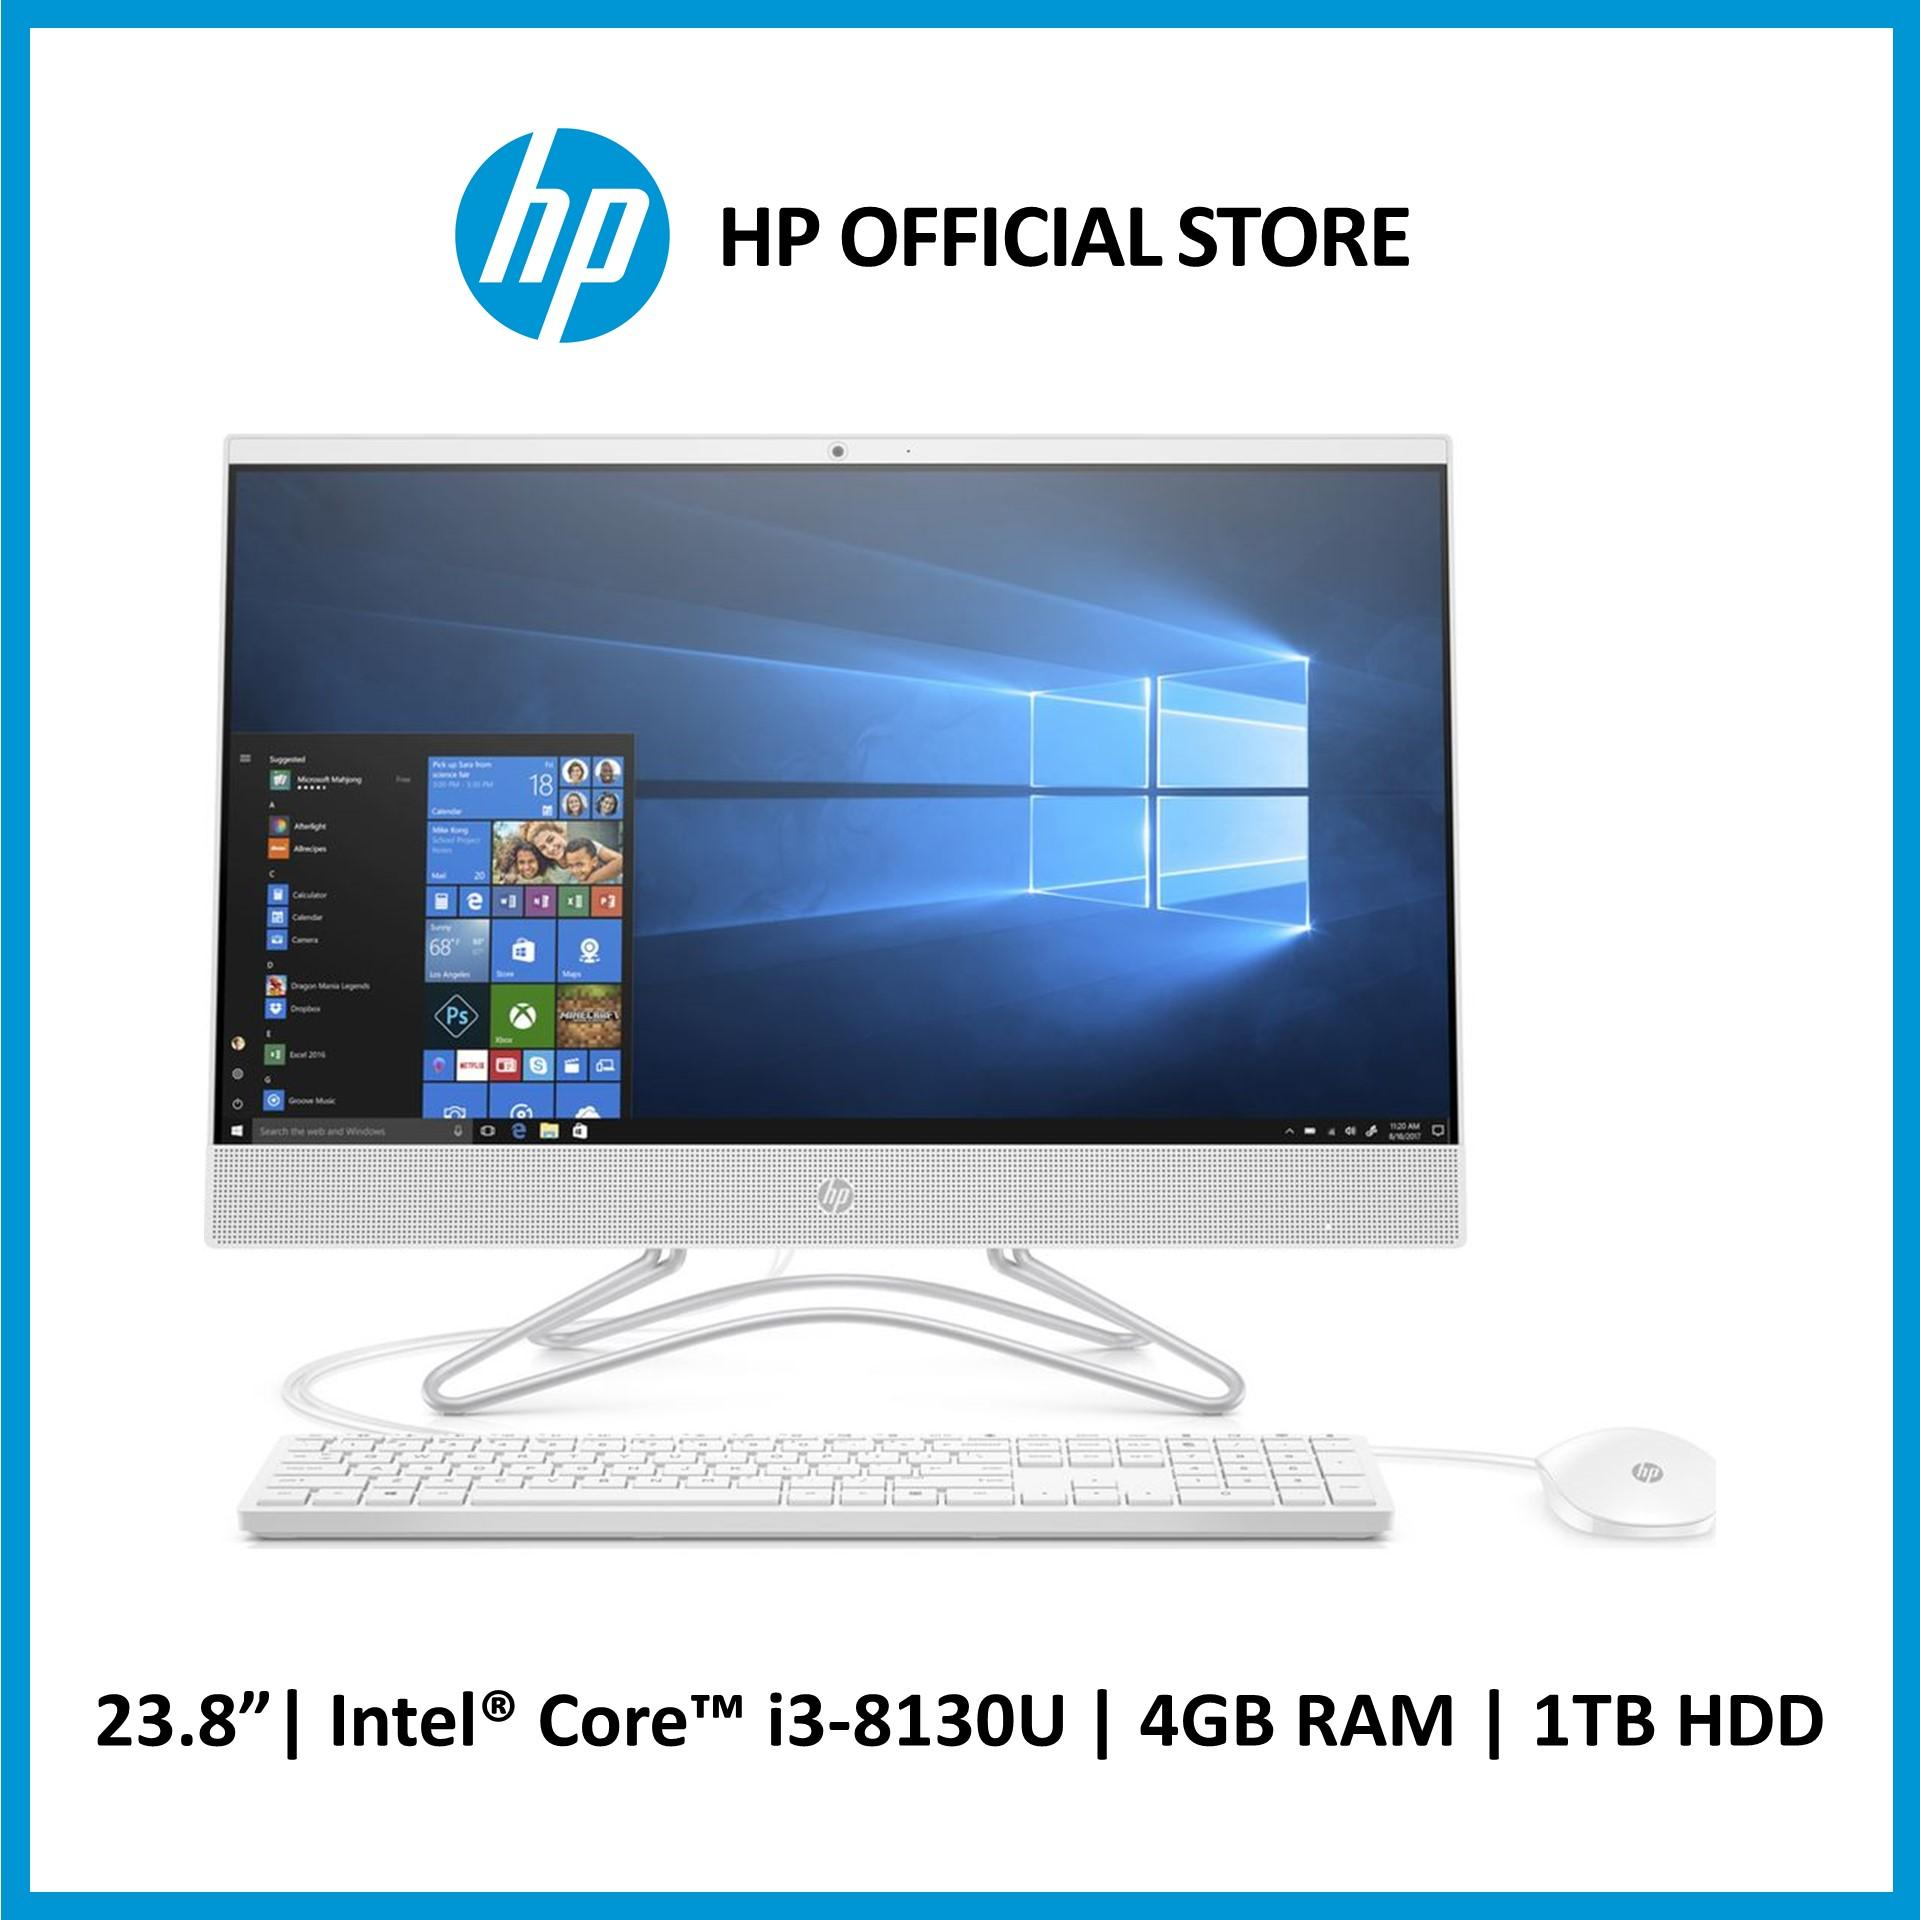 HP All-in-One Desktop PC 24-f0031d (23 8